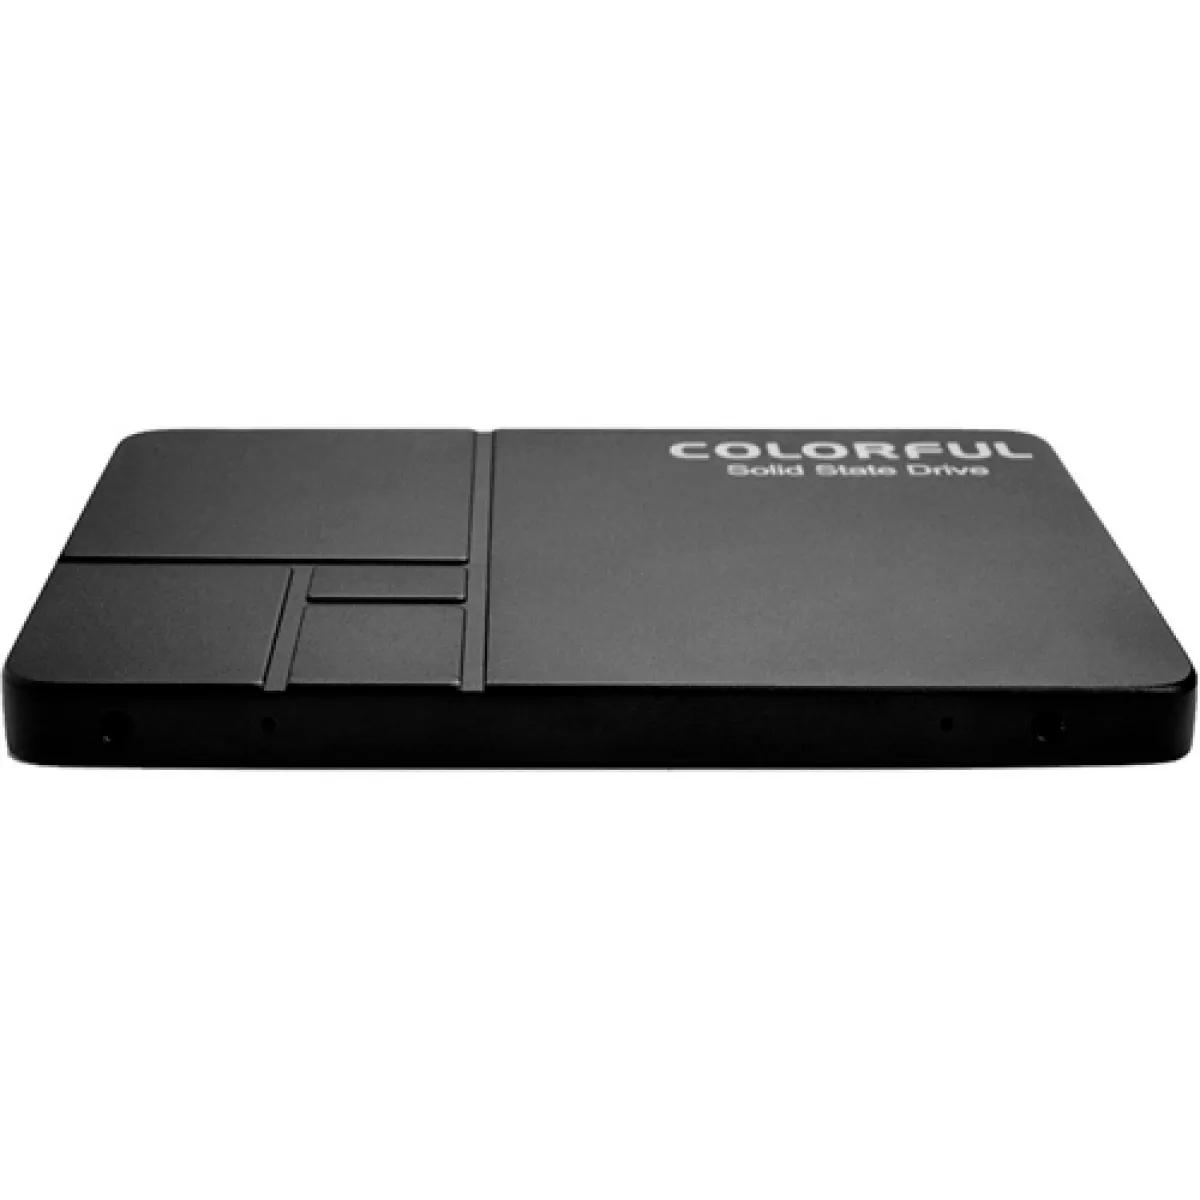 "SSD Colorful 250GB 2,5"" Sata III - SL500-250GB-IB55FE"